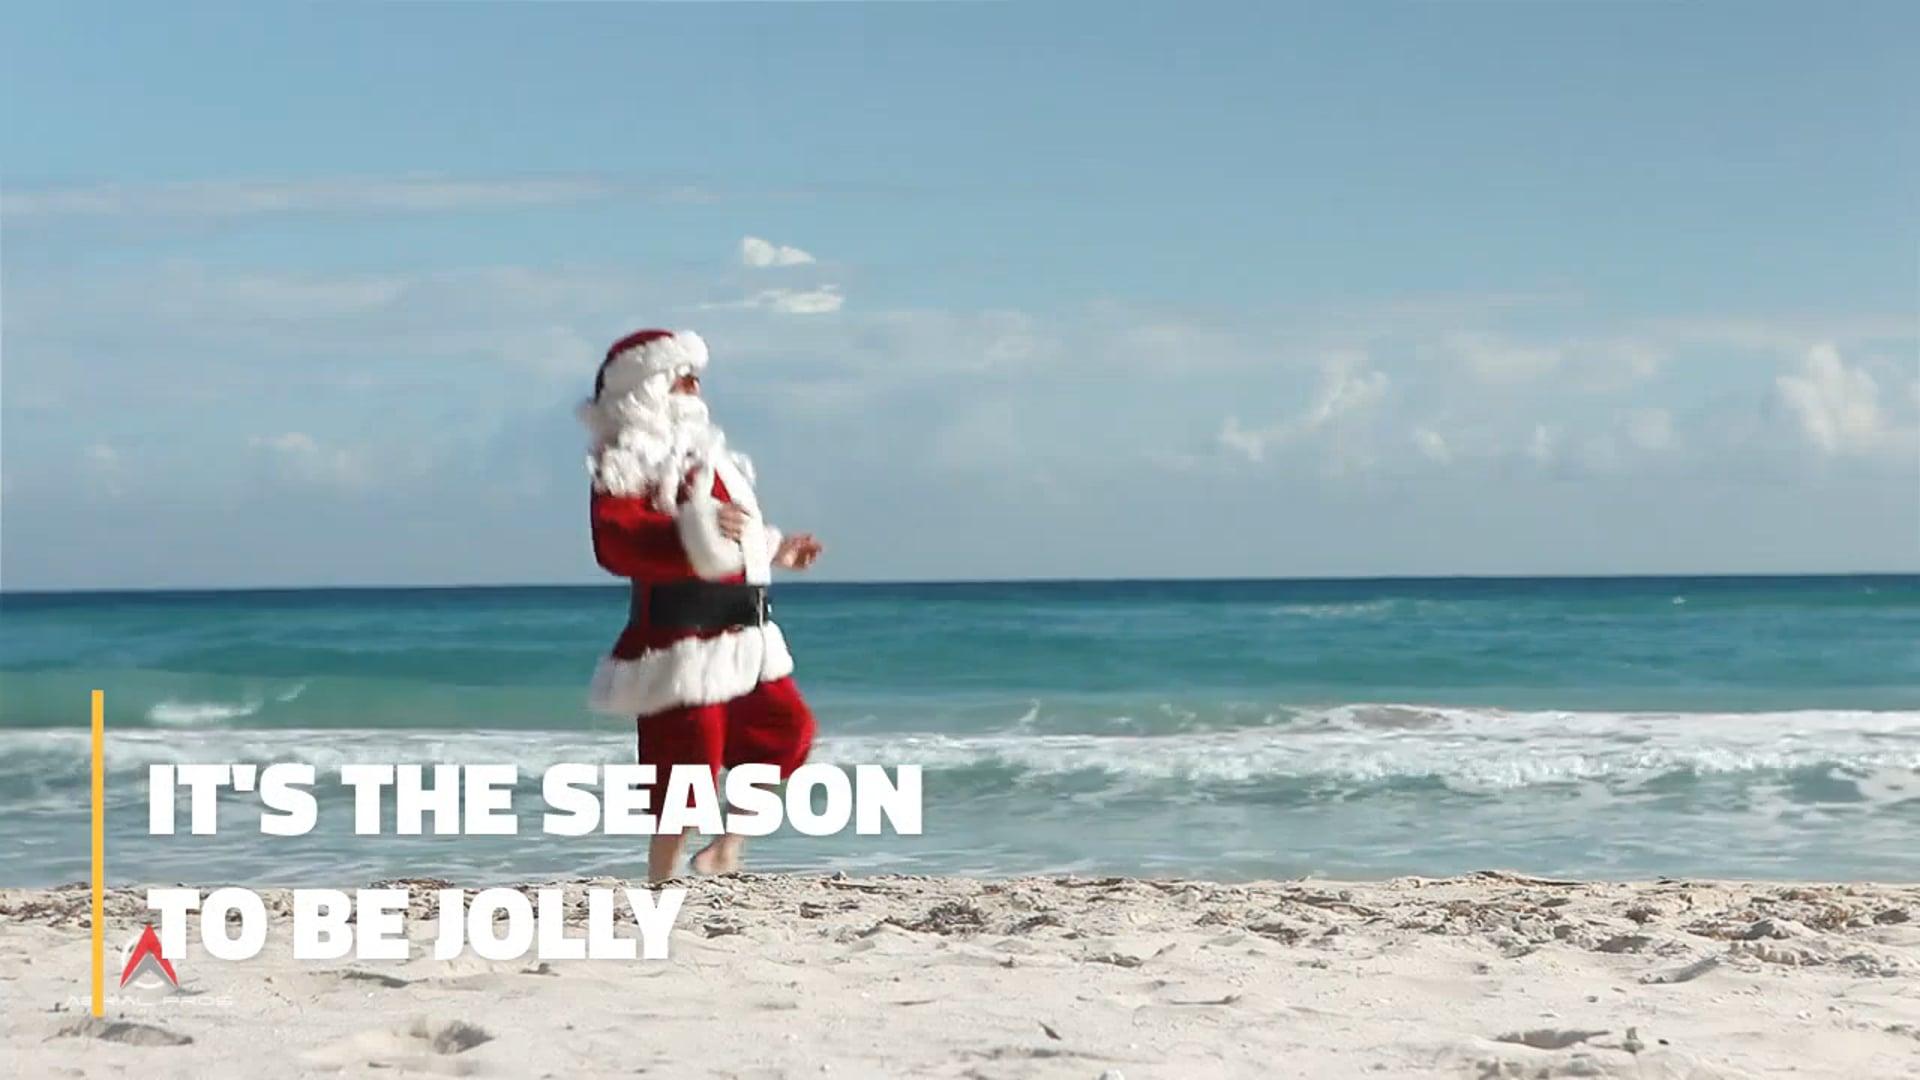 Royal Atlantic Merry Christmas Video